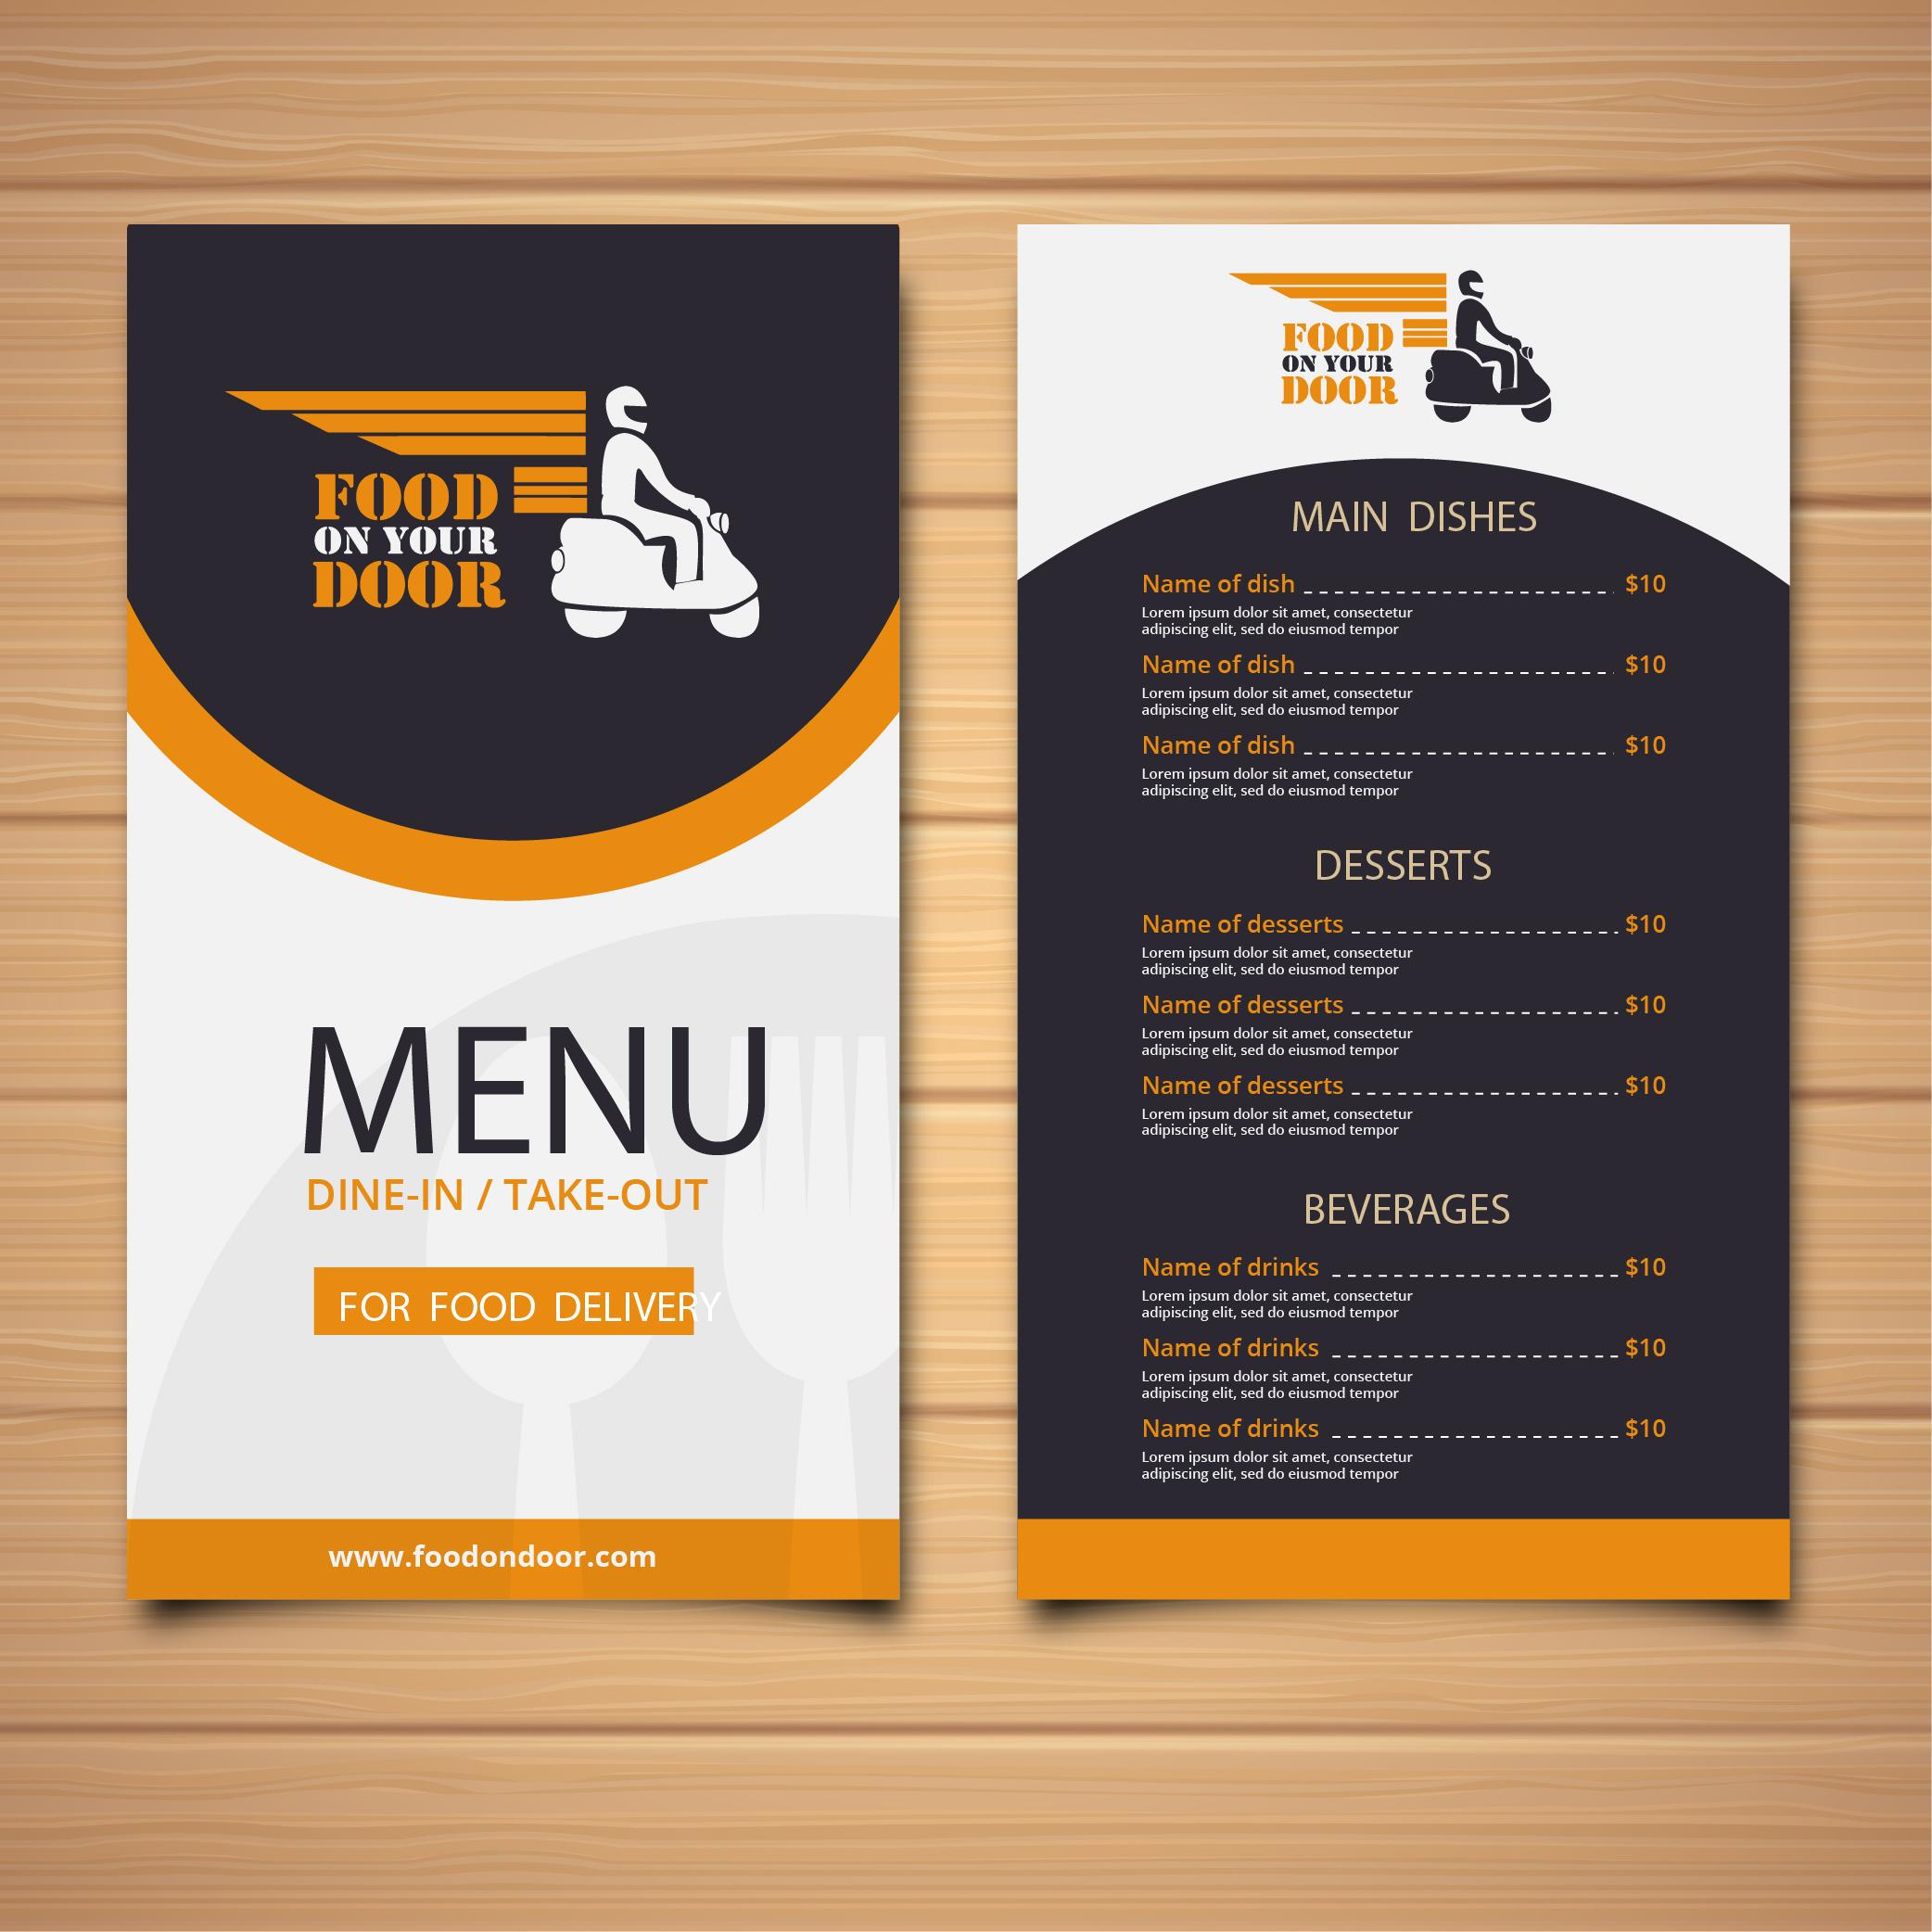 Food Delivery services provider menu card design by Badri Design